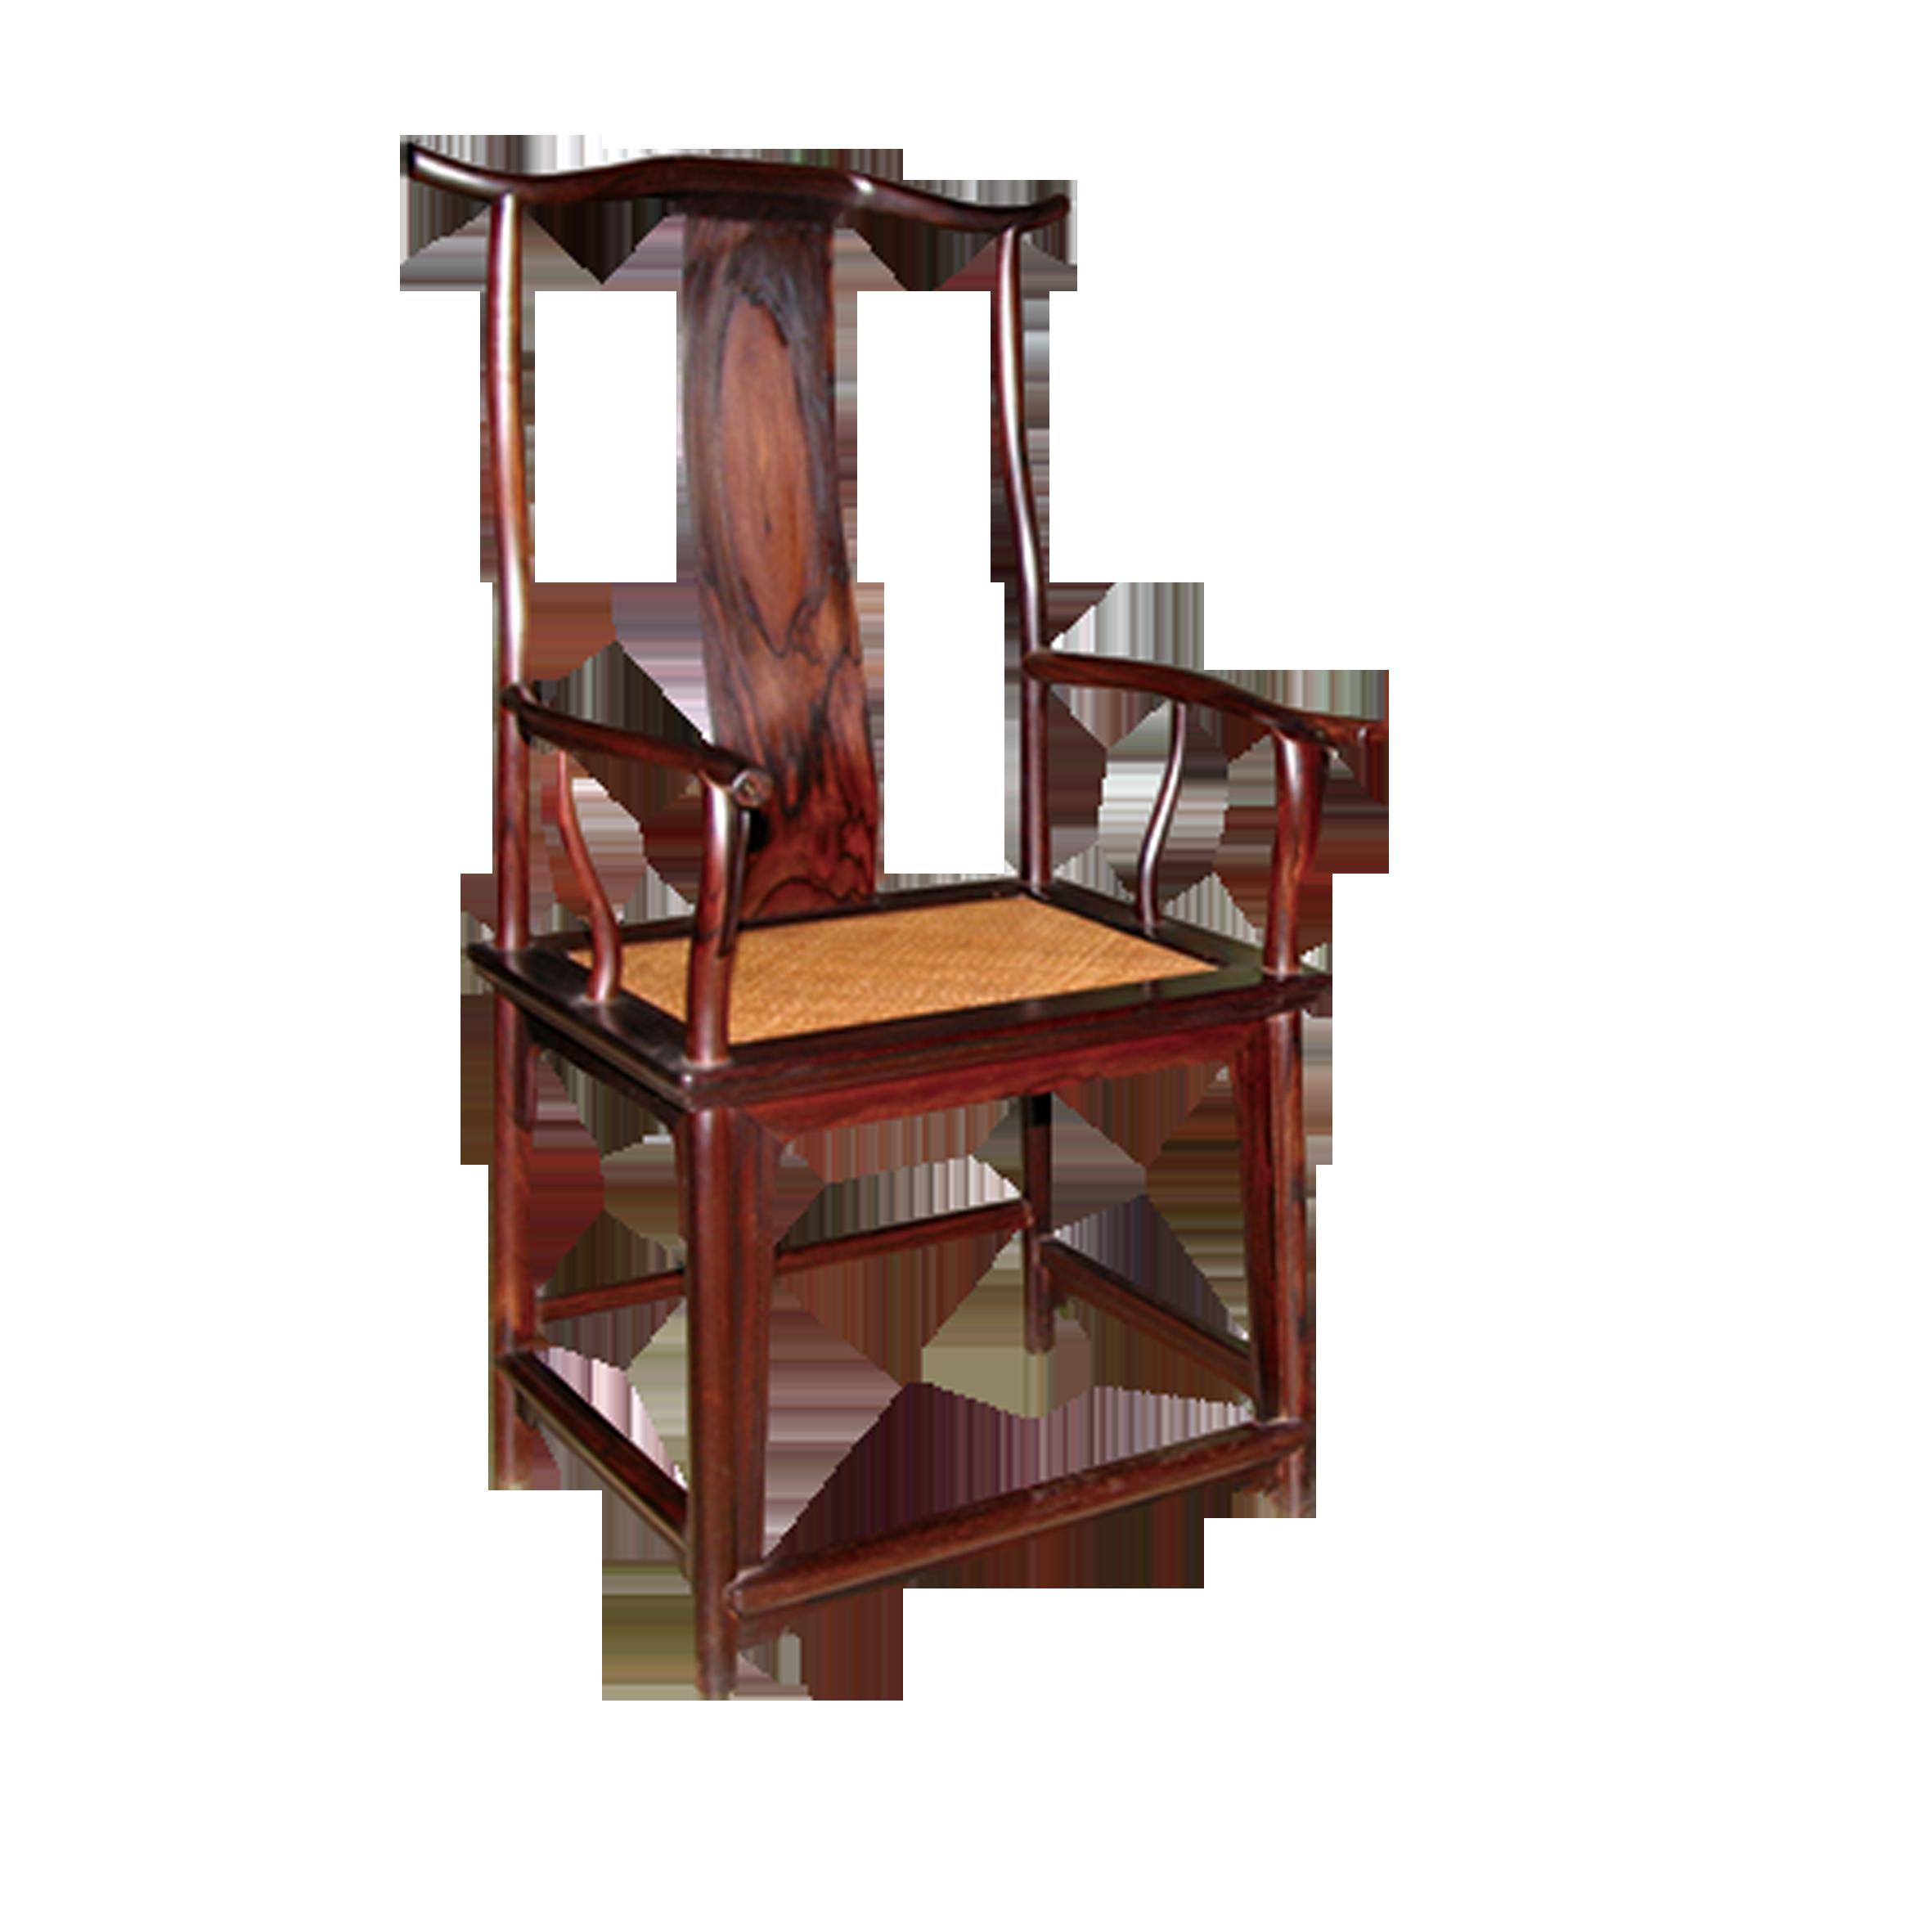 Chair Table Chinese furniture u660eu5f0fu5bb6u5177 Wood - An old ...